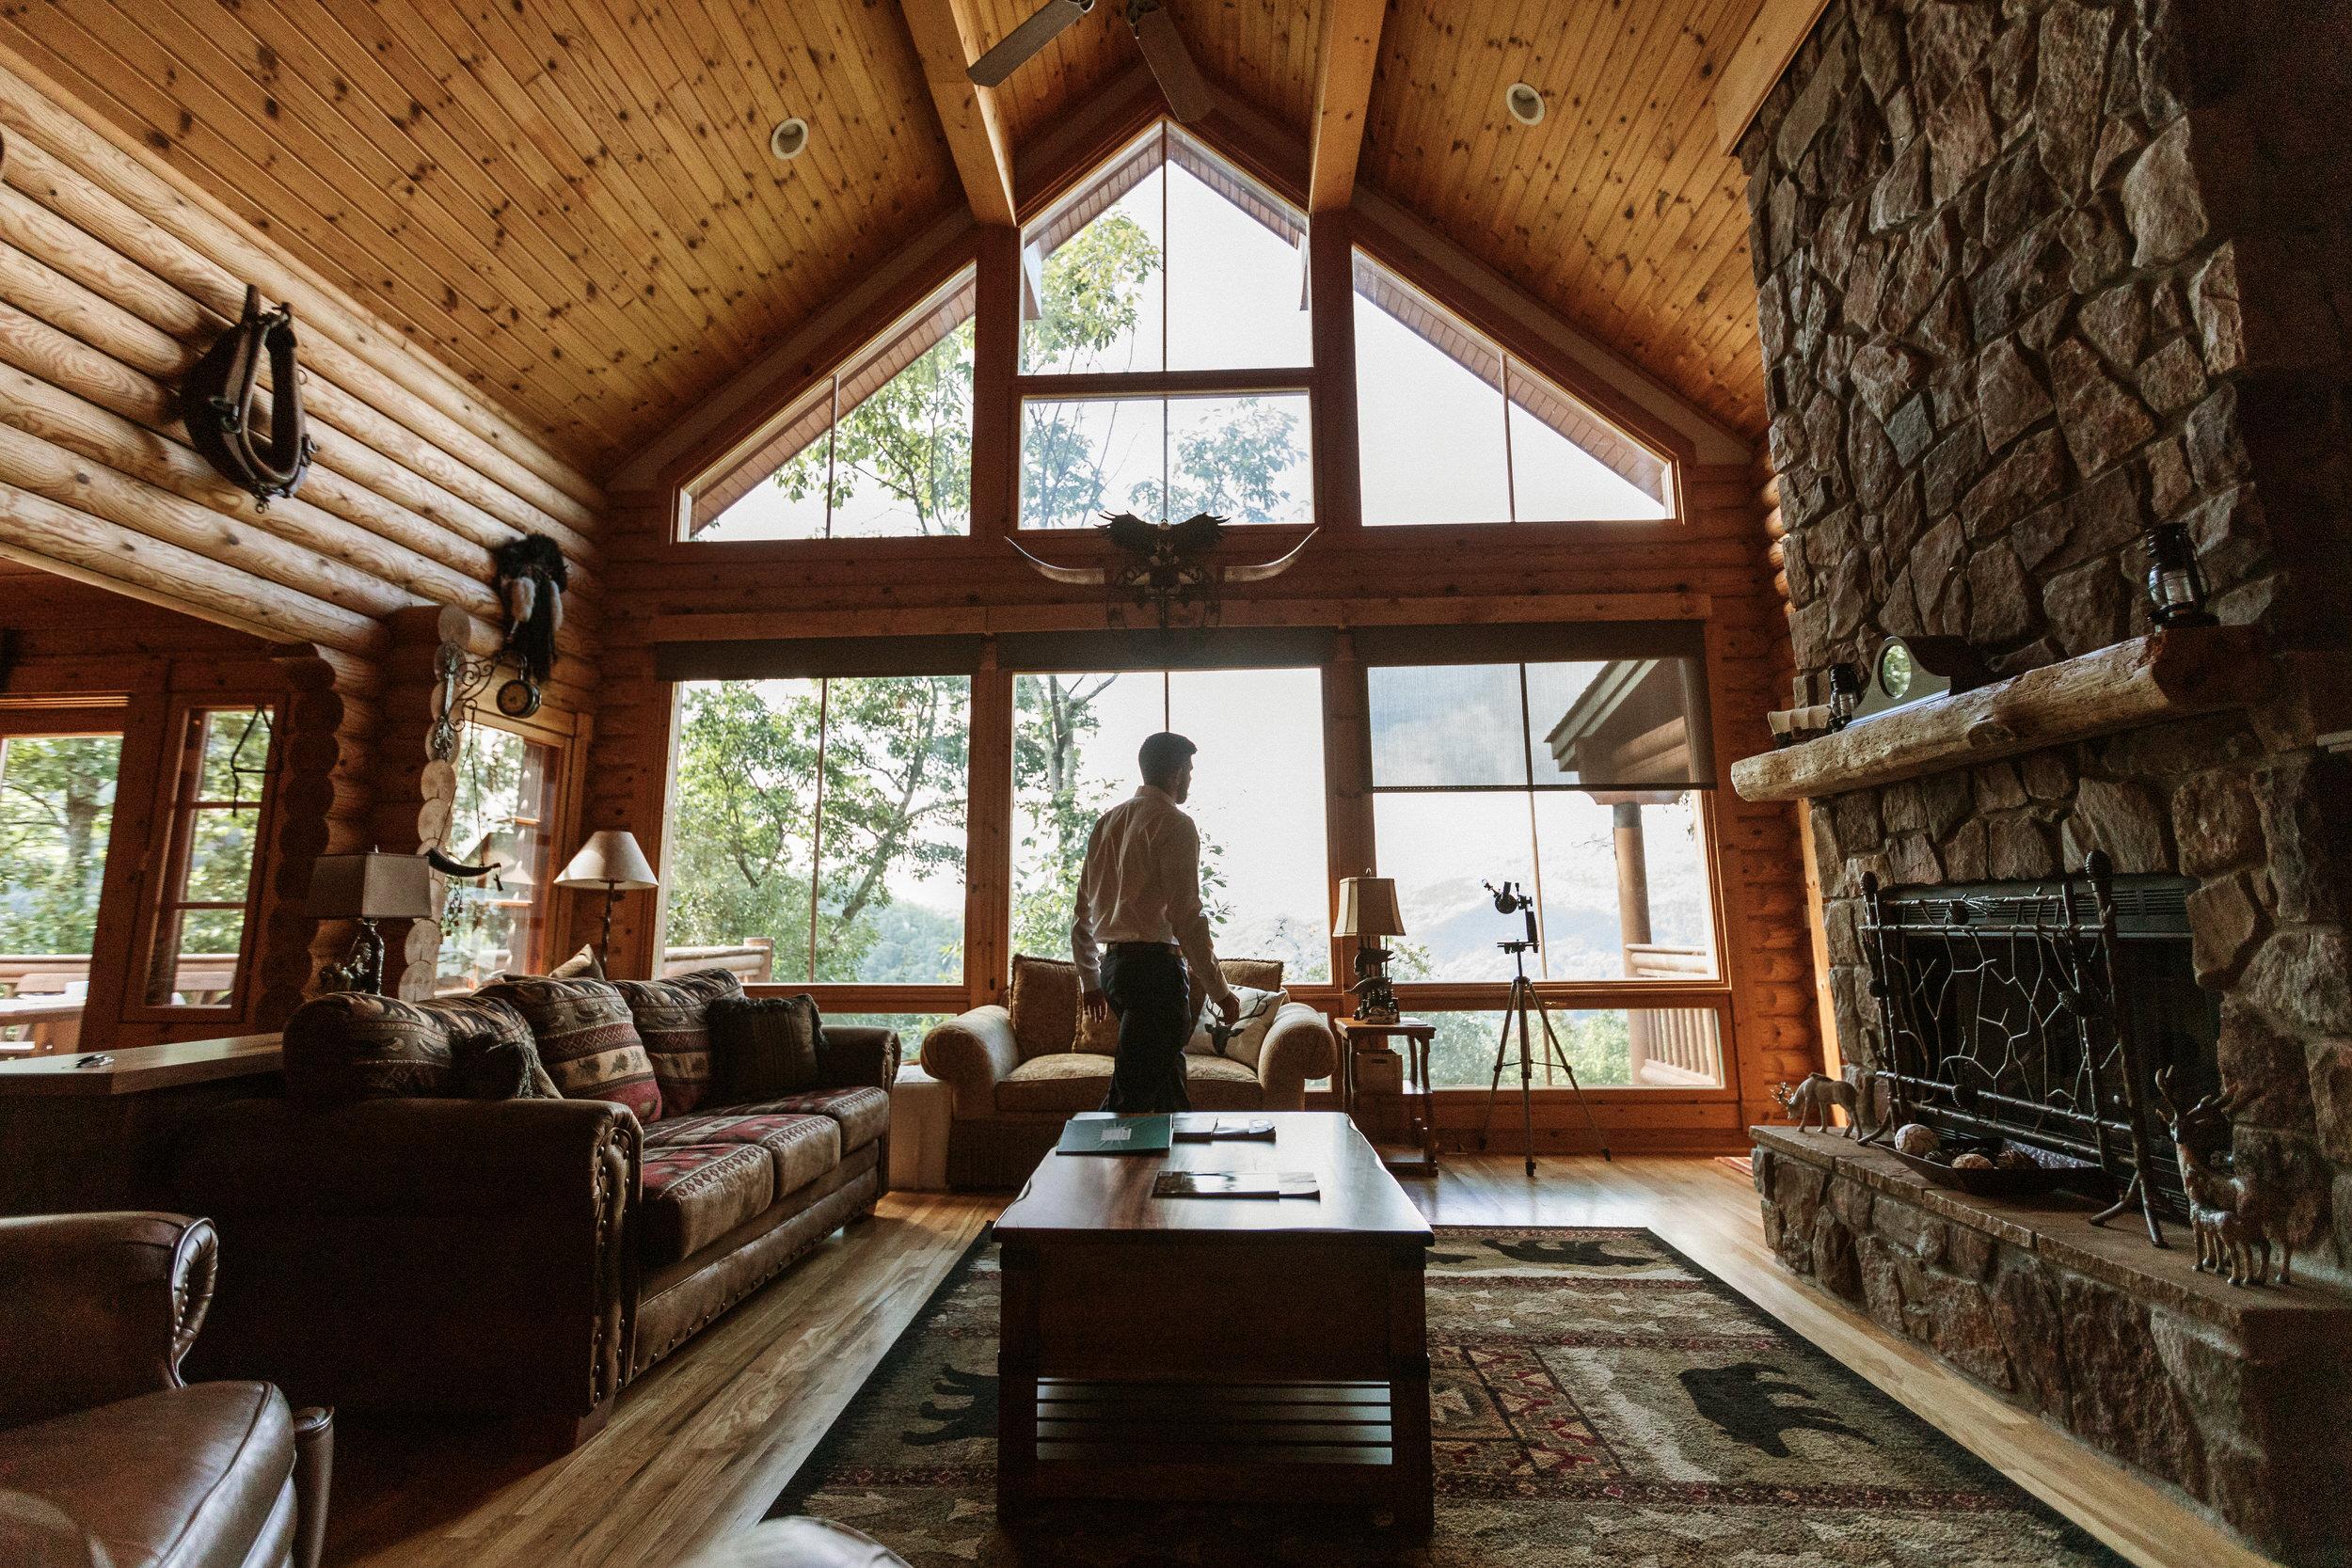 2. Groom's Morning - Cole + Rachel's Great Smoky Mountain National Park Elopement-70.jpg